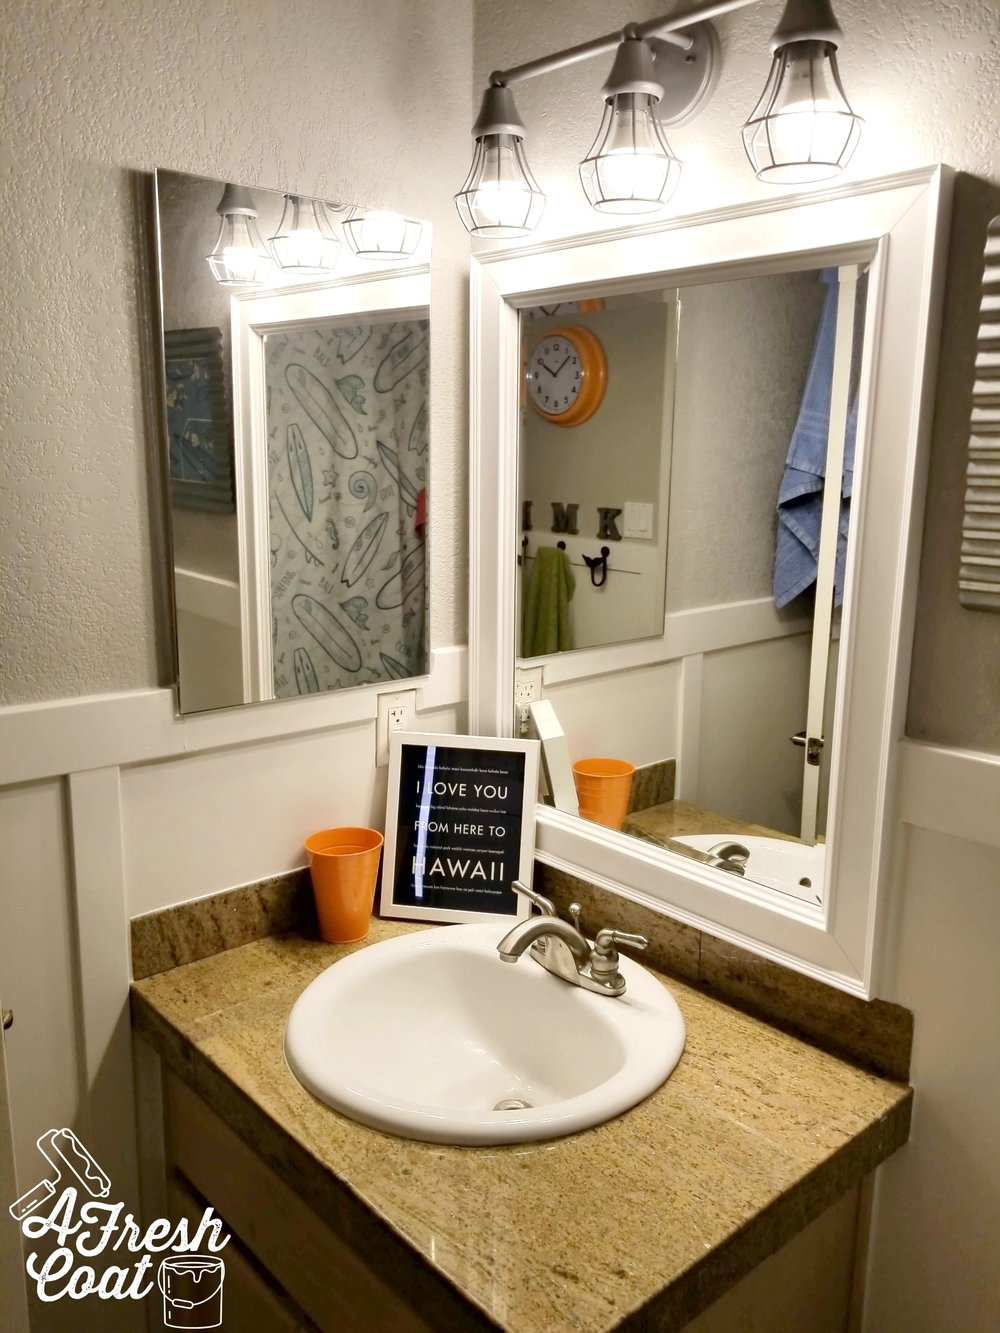 kane lua hawaiian boys bathroom makeover a fresh coat yuma 4jpg - Boys Bathroom